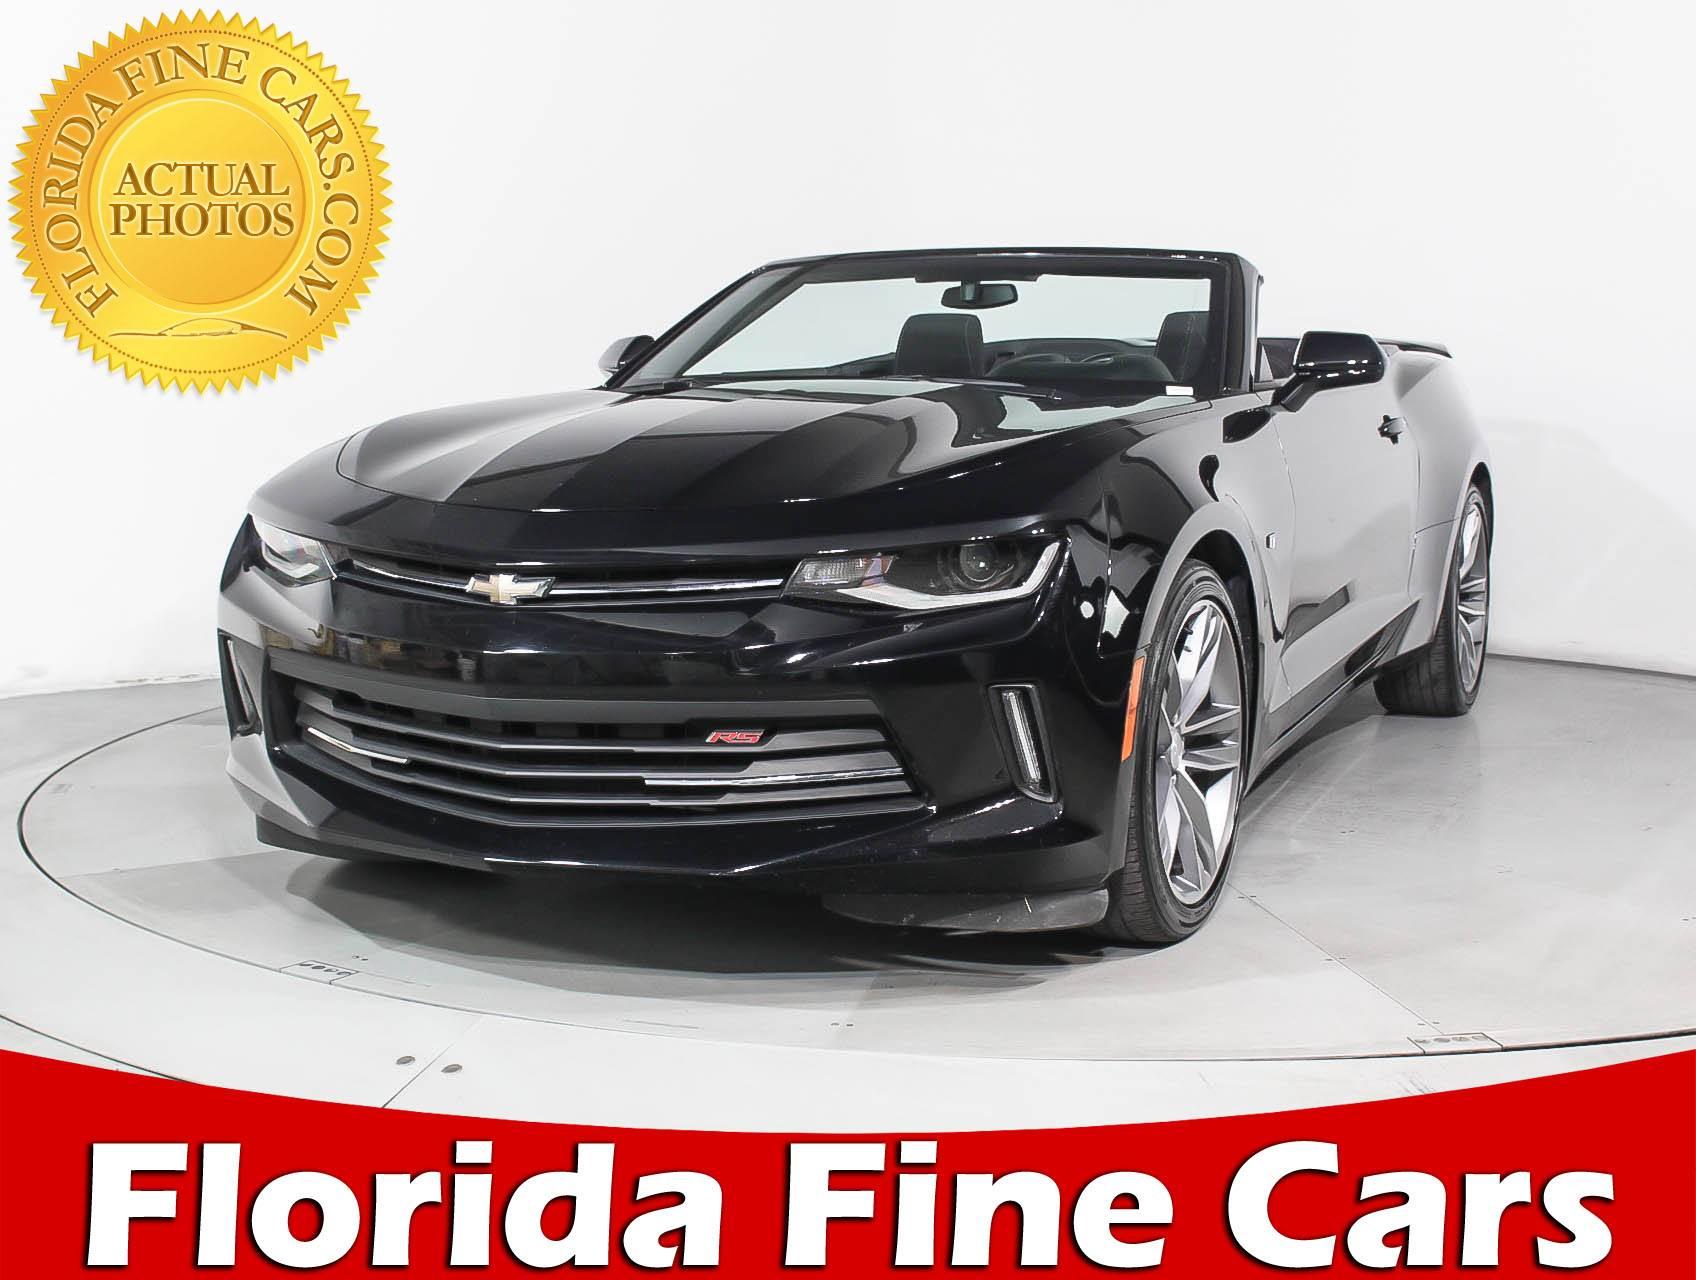 Florida Fine Cars Best Car 2018